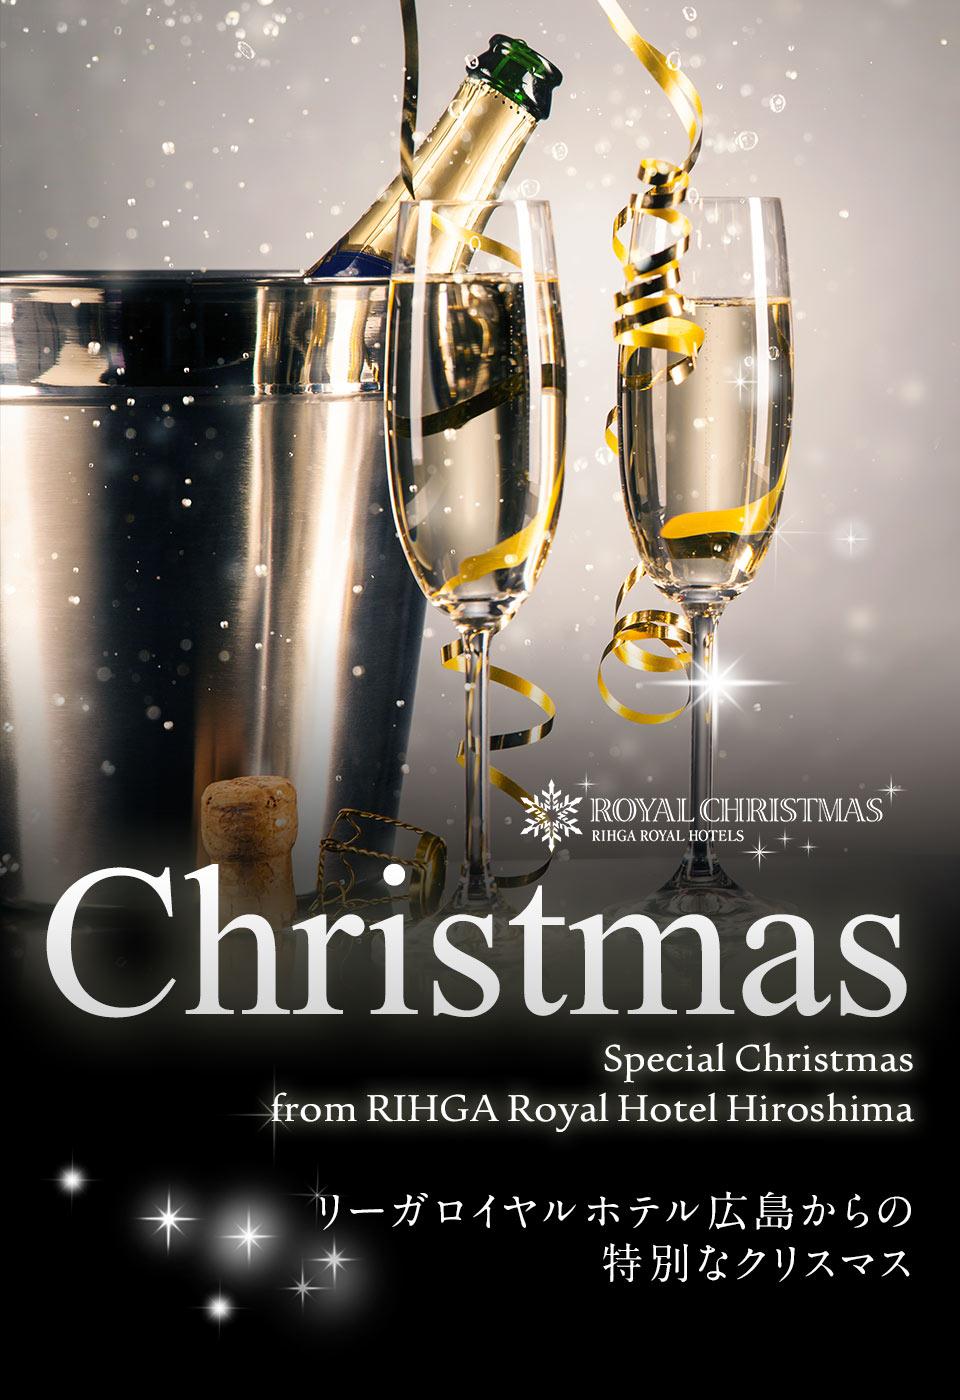 ROYAL CHIRISTMAS リーガロイヤルホテル広島からの特別なクリスマス